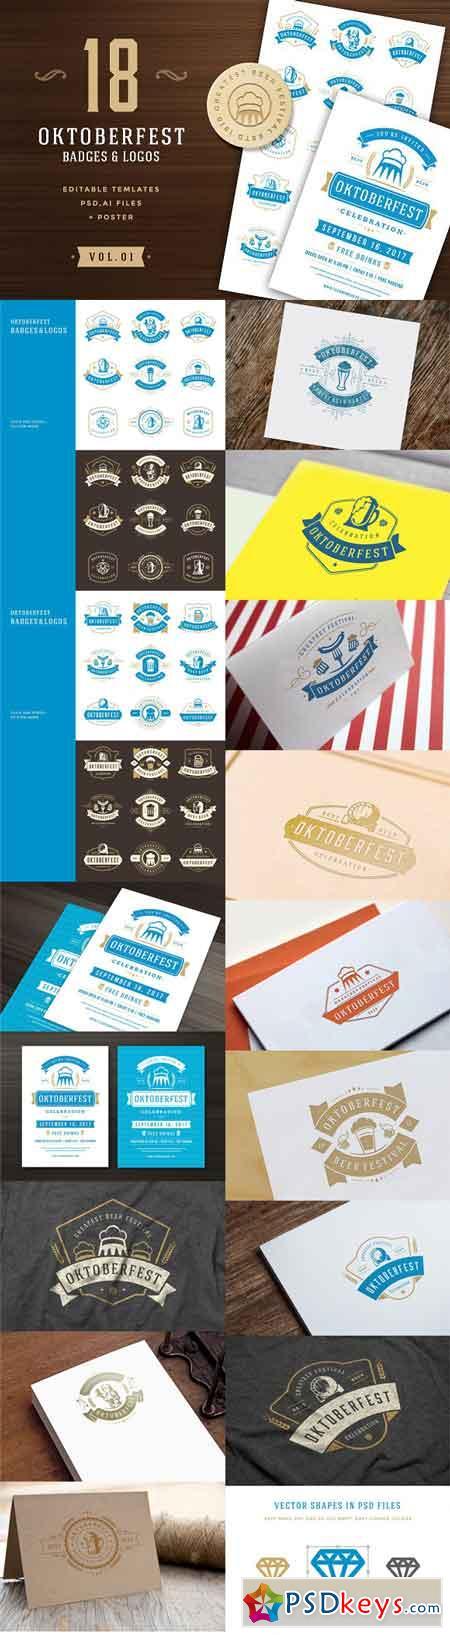 Oktoberfest badges and logos 1759345